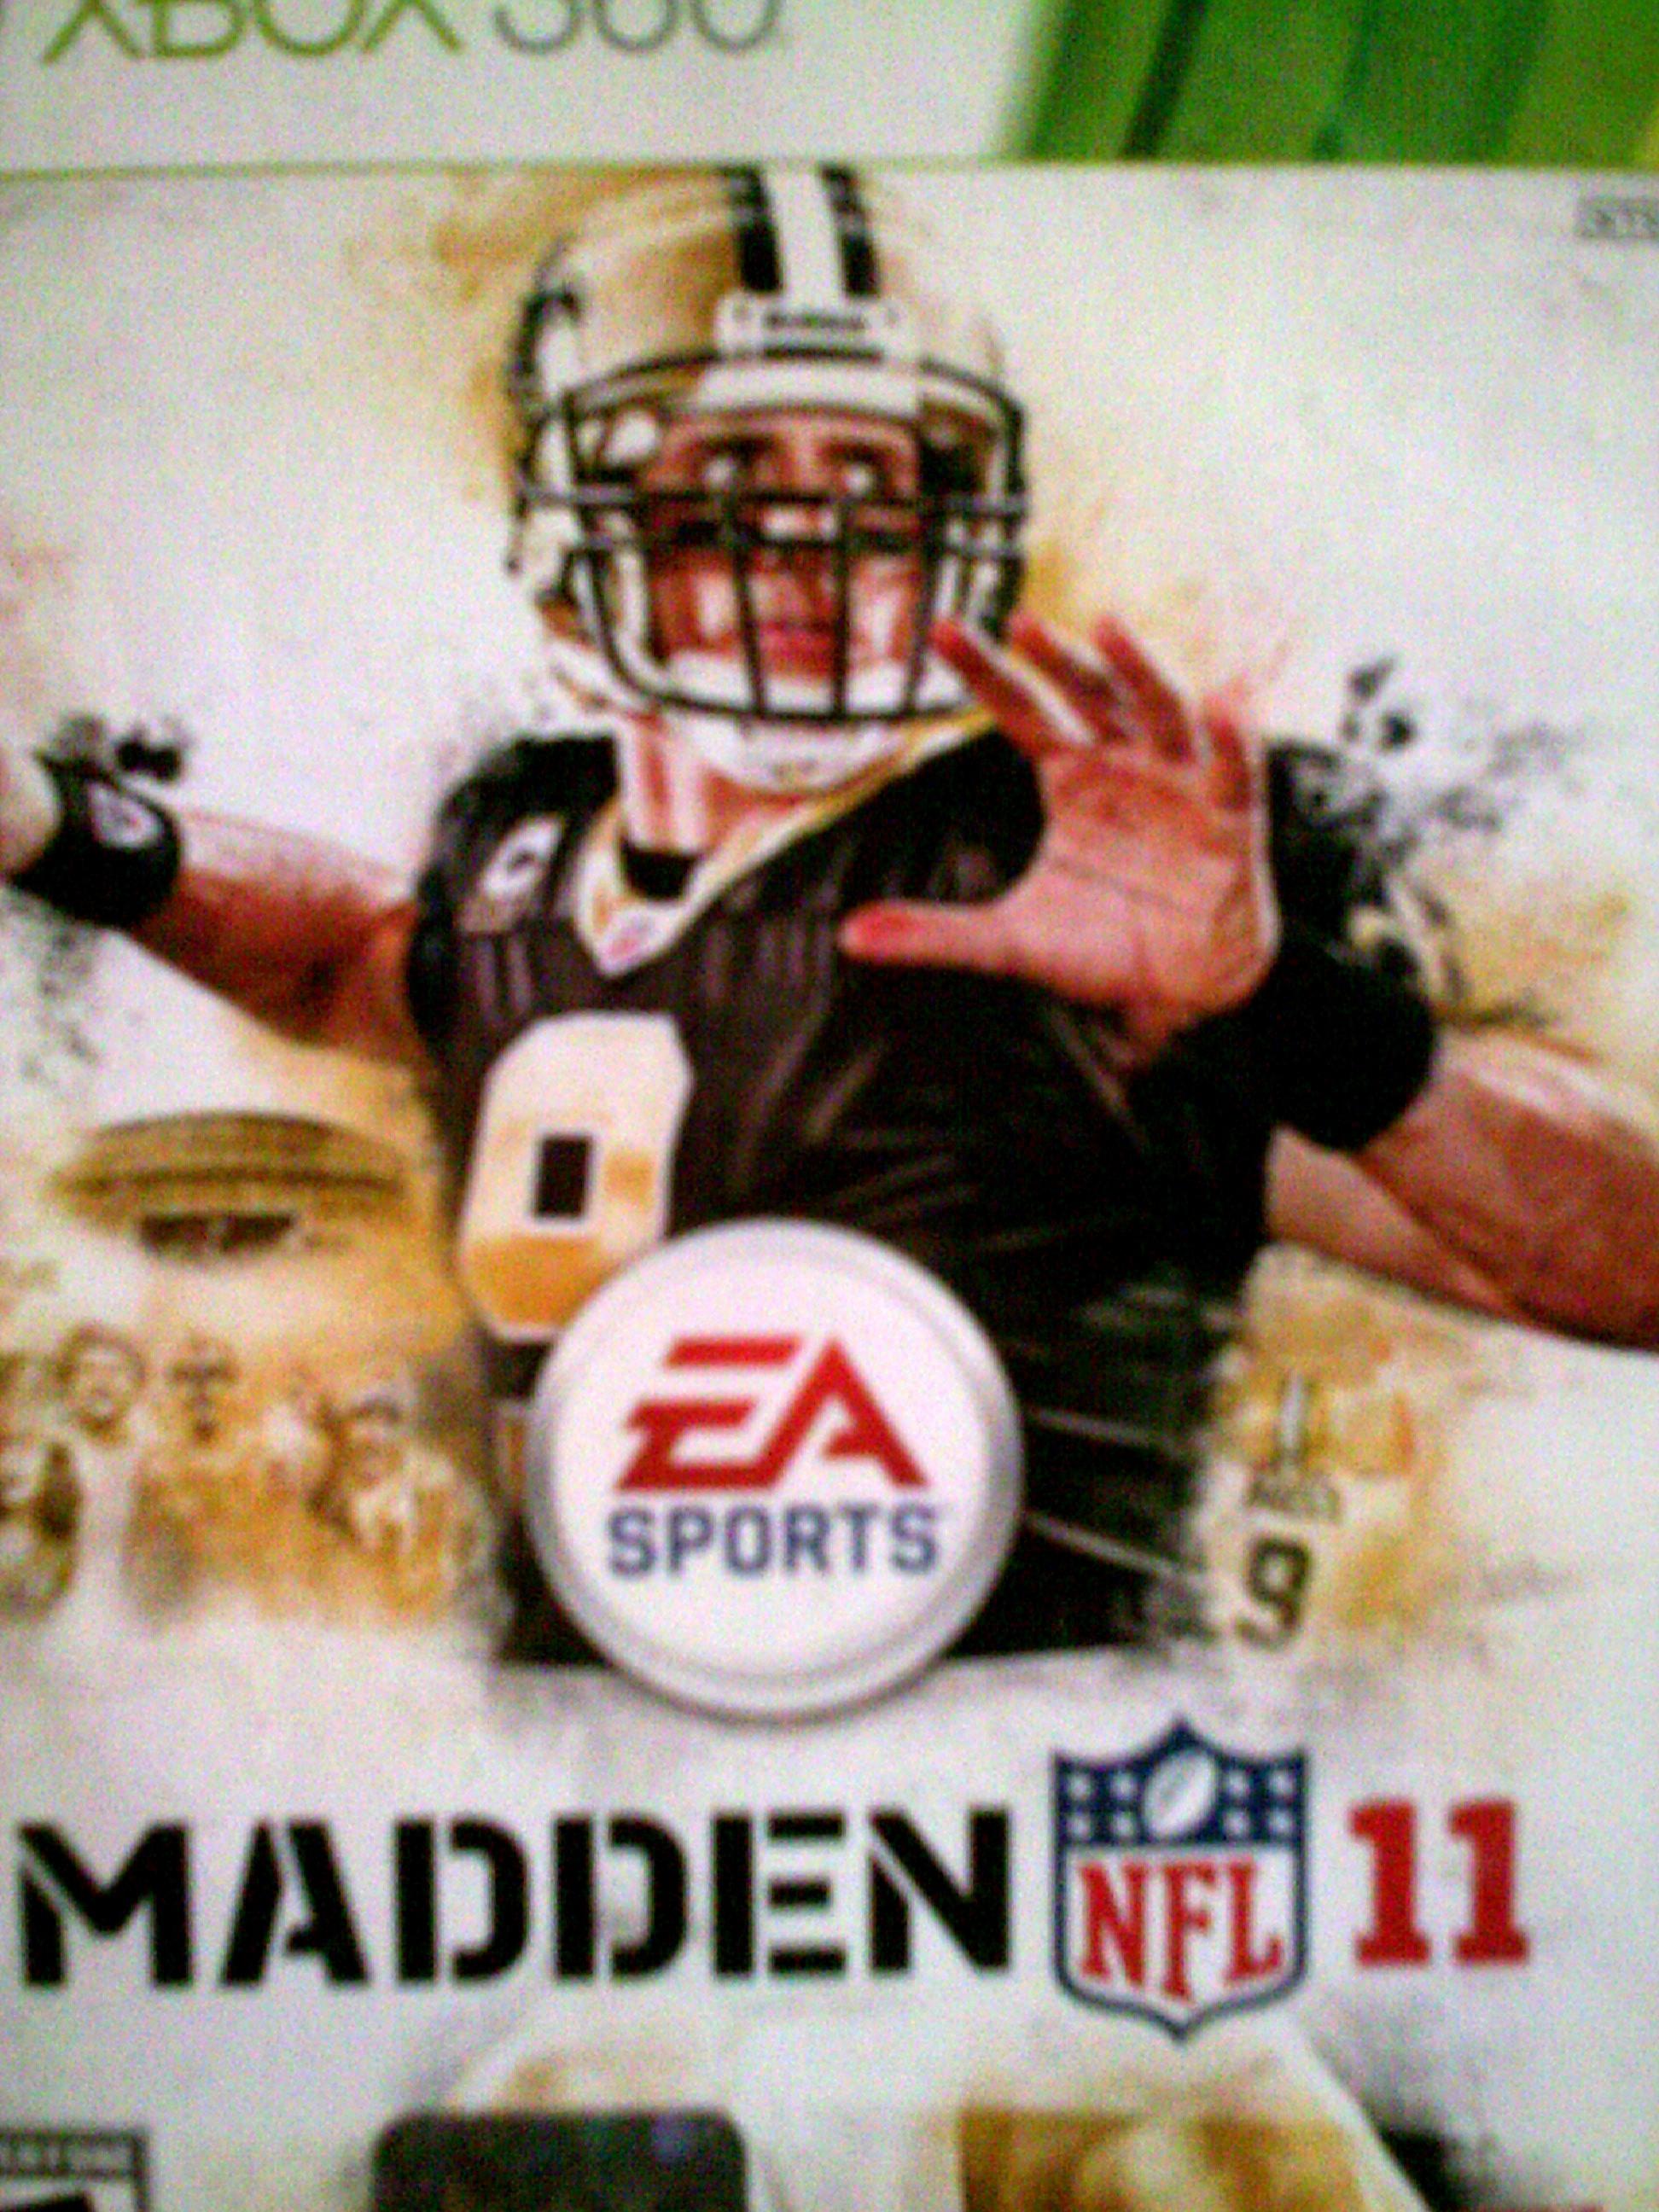 Drew Brees in Madden NFL 11 (2010)